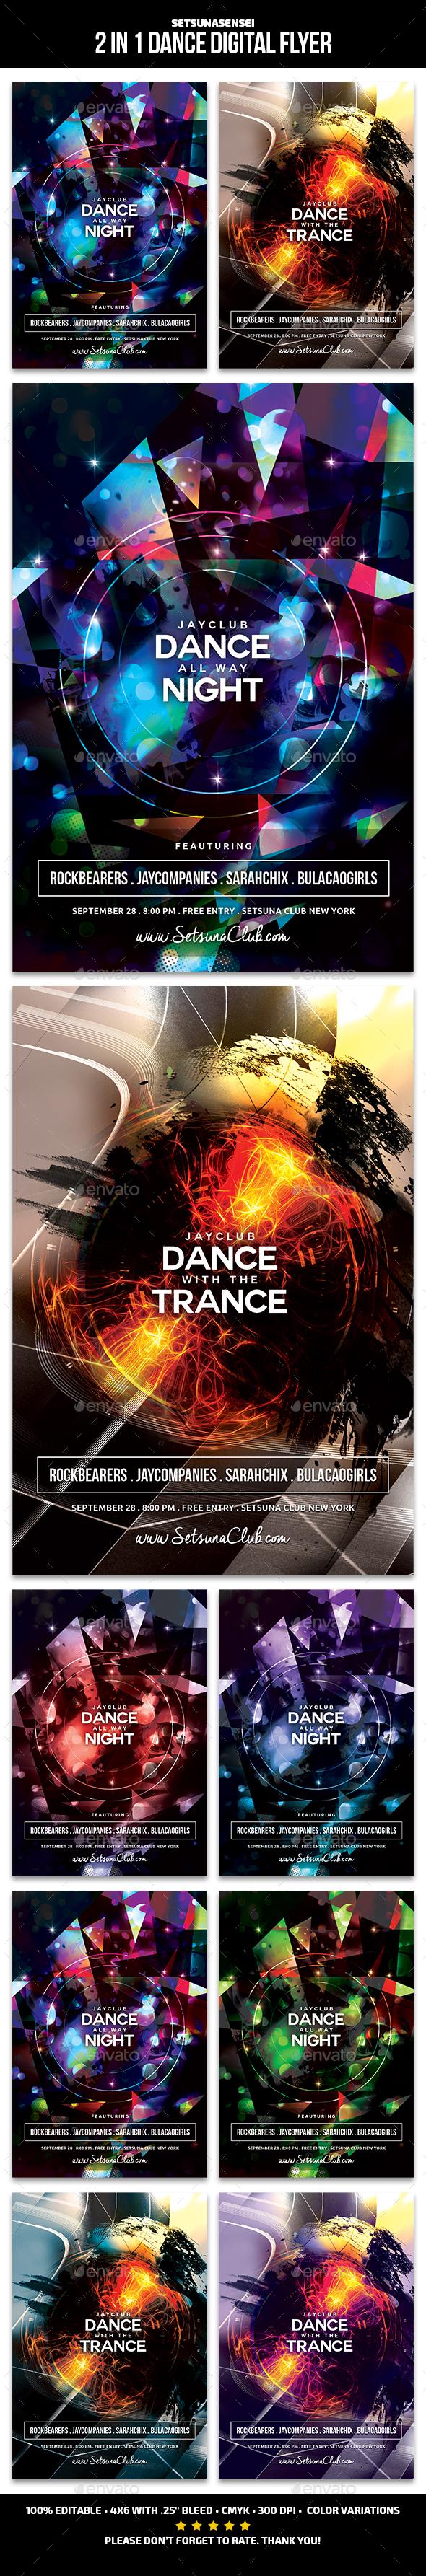 2 in 1 Dance Digital Flyer - Clubs & Parties Events